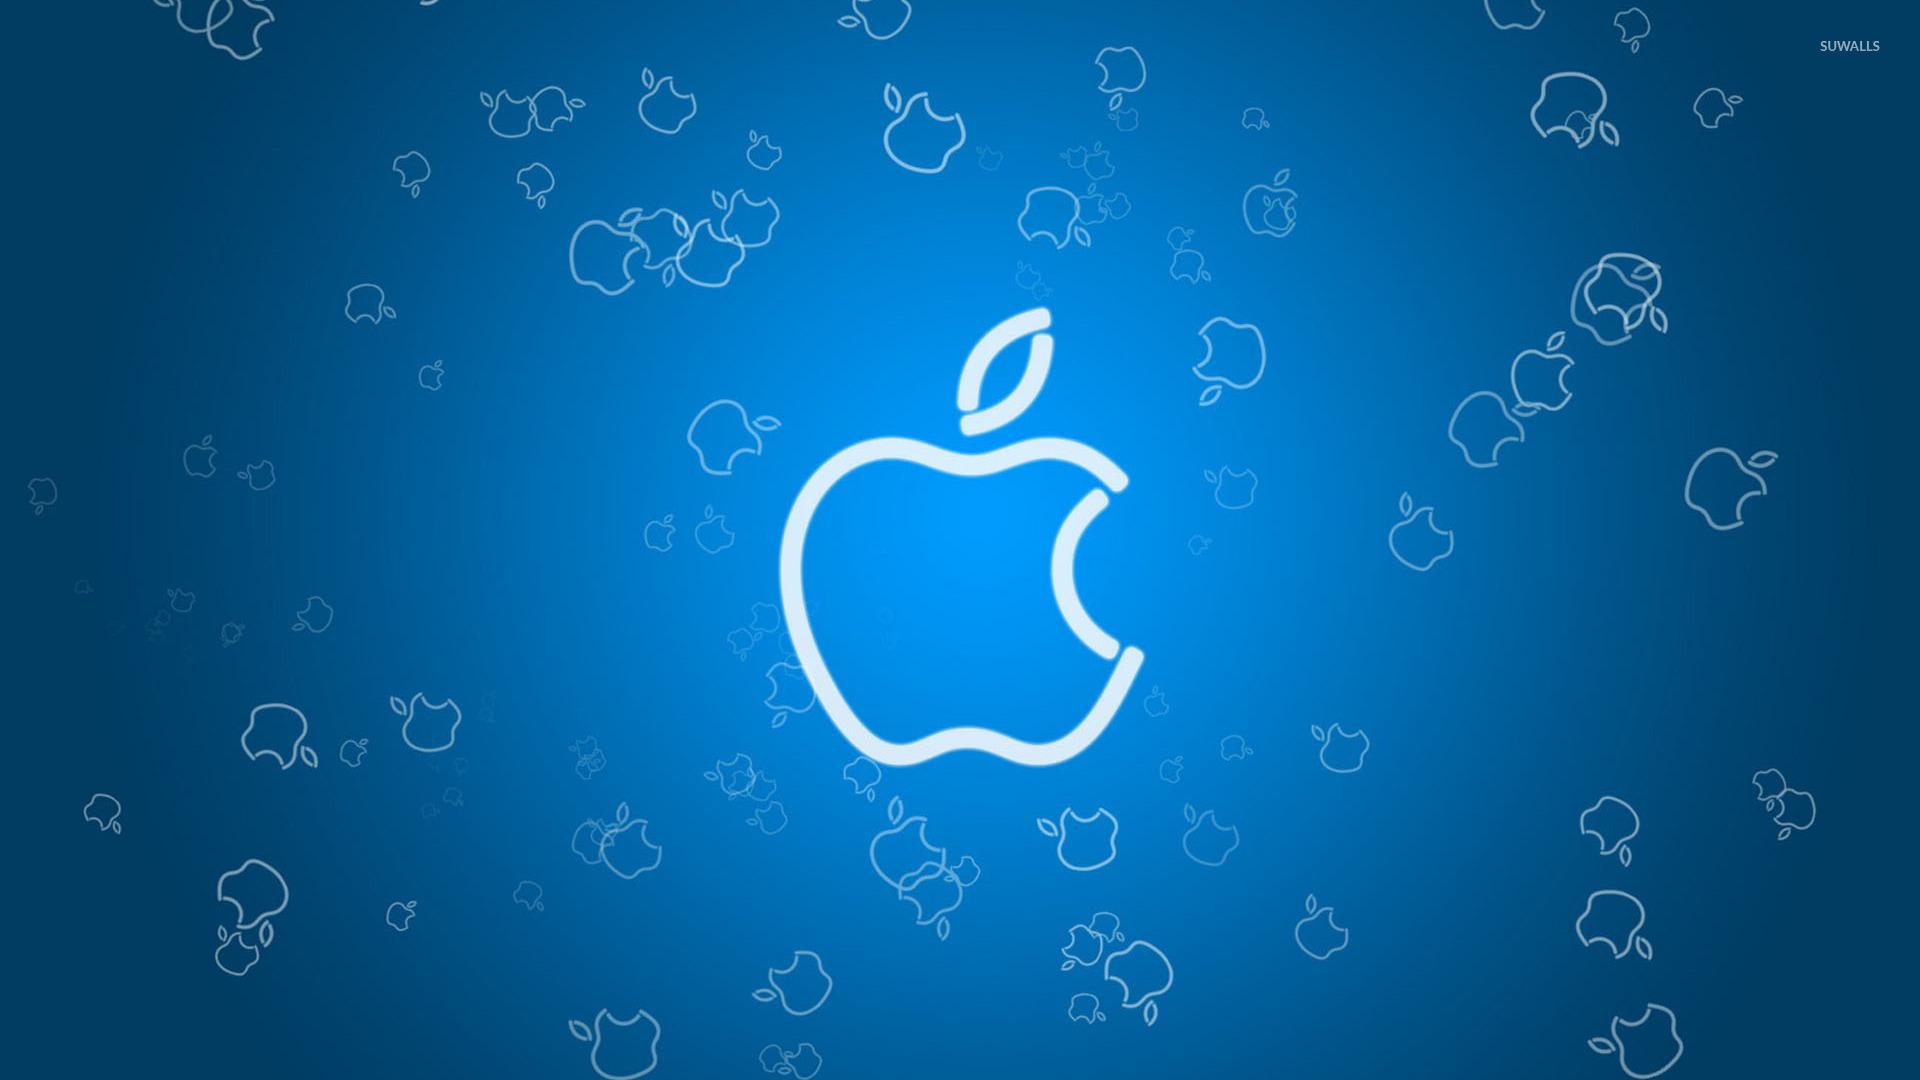 Apple Logo Outline Wallpaper Computer Wallpapers 25996